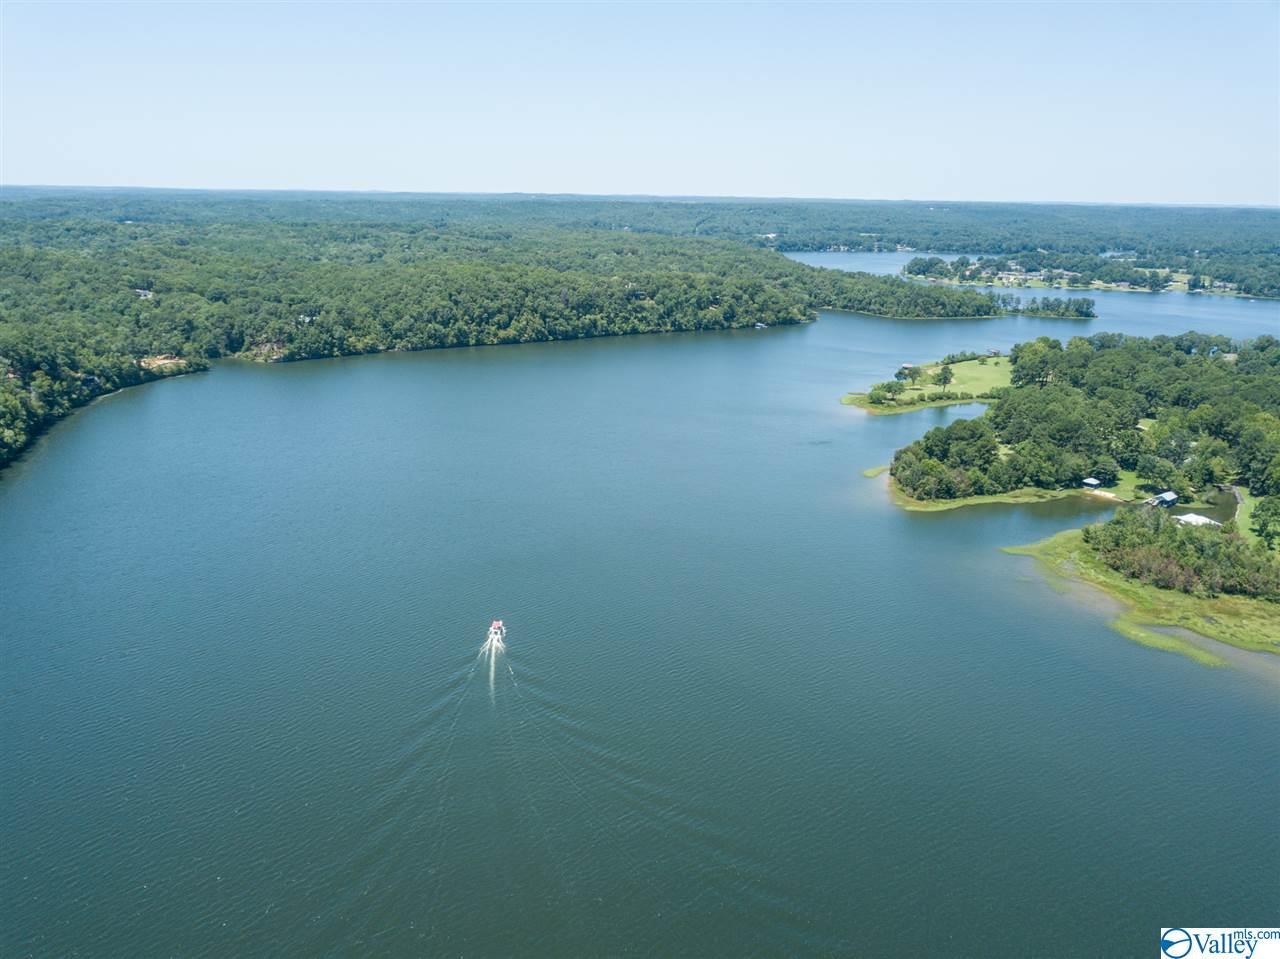 https://s3-us-west-2.amazonaws.com/cevado.idx1.ssl/naris/1124065/15139-waters-edge-drive-northport-35475-96fce1da_48.jpg